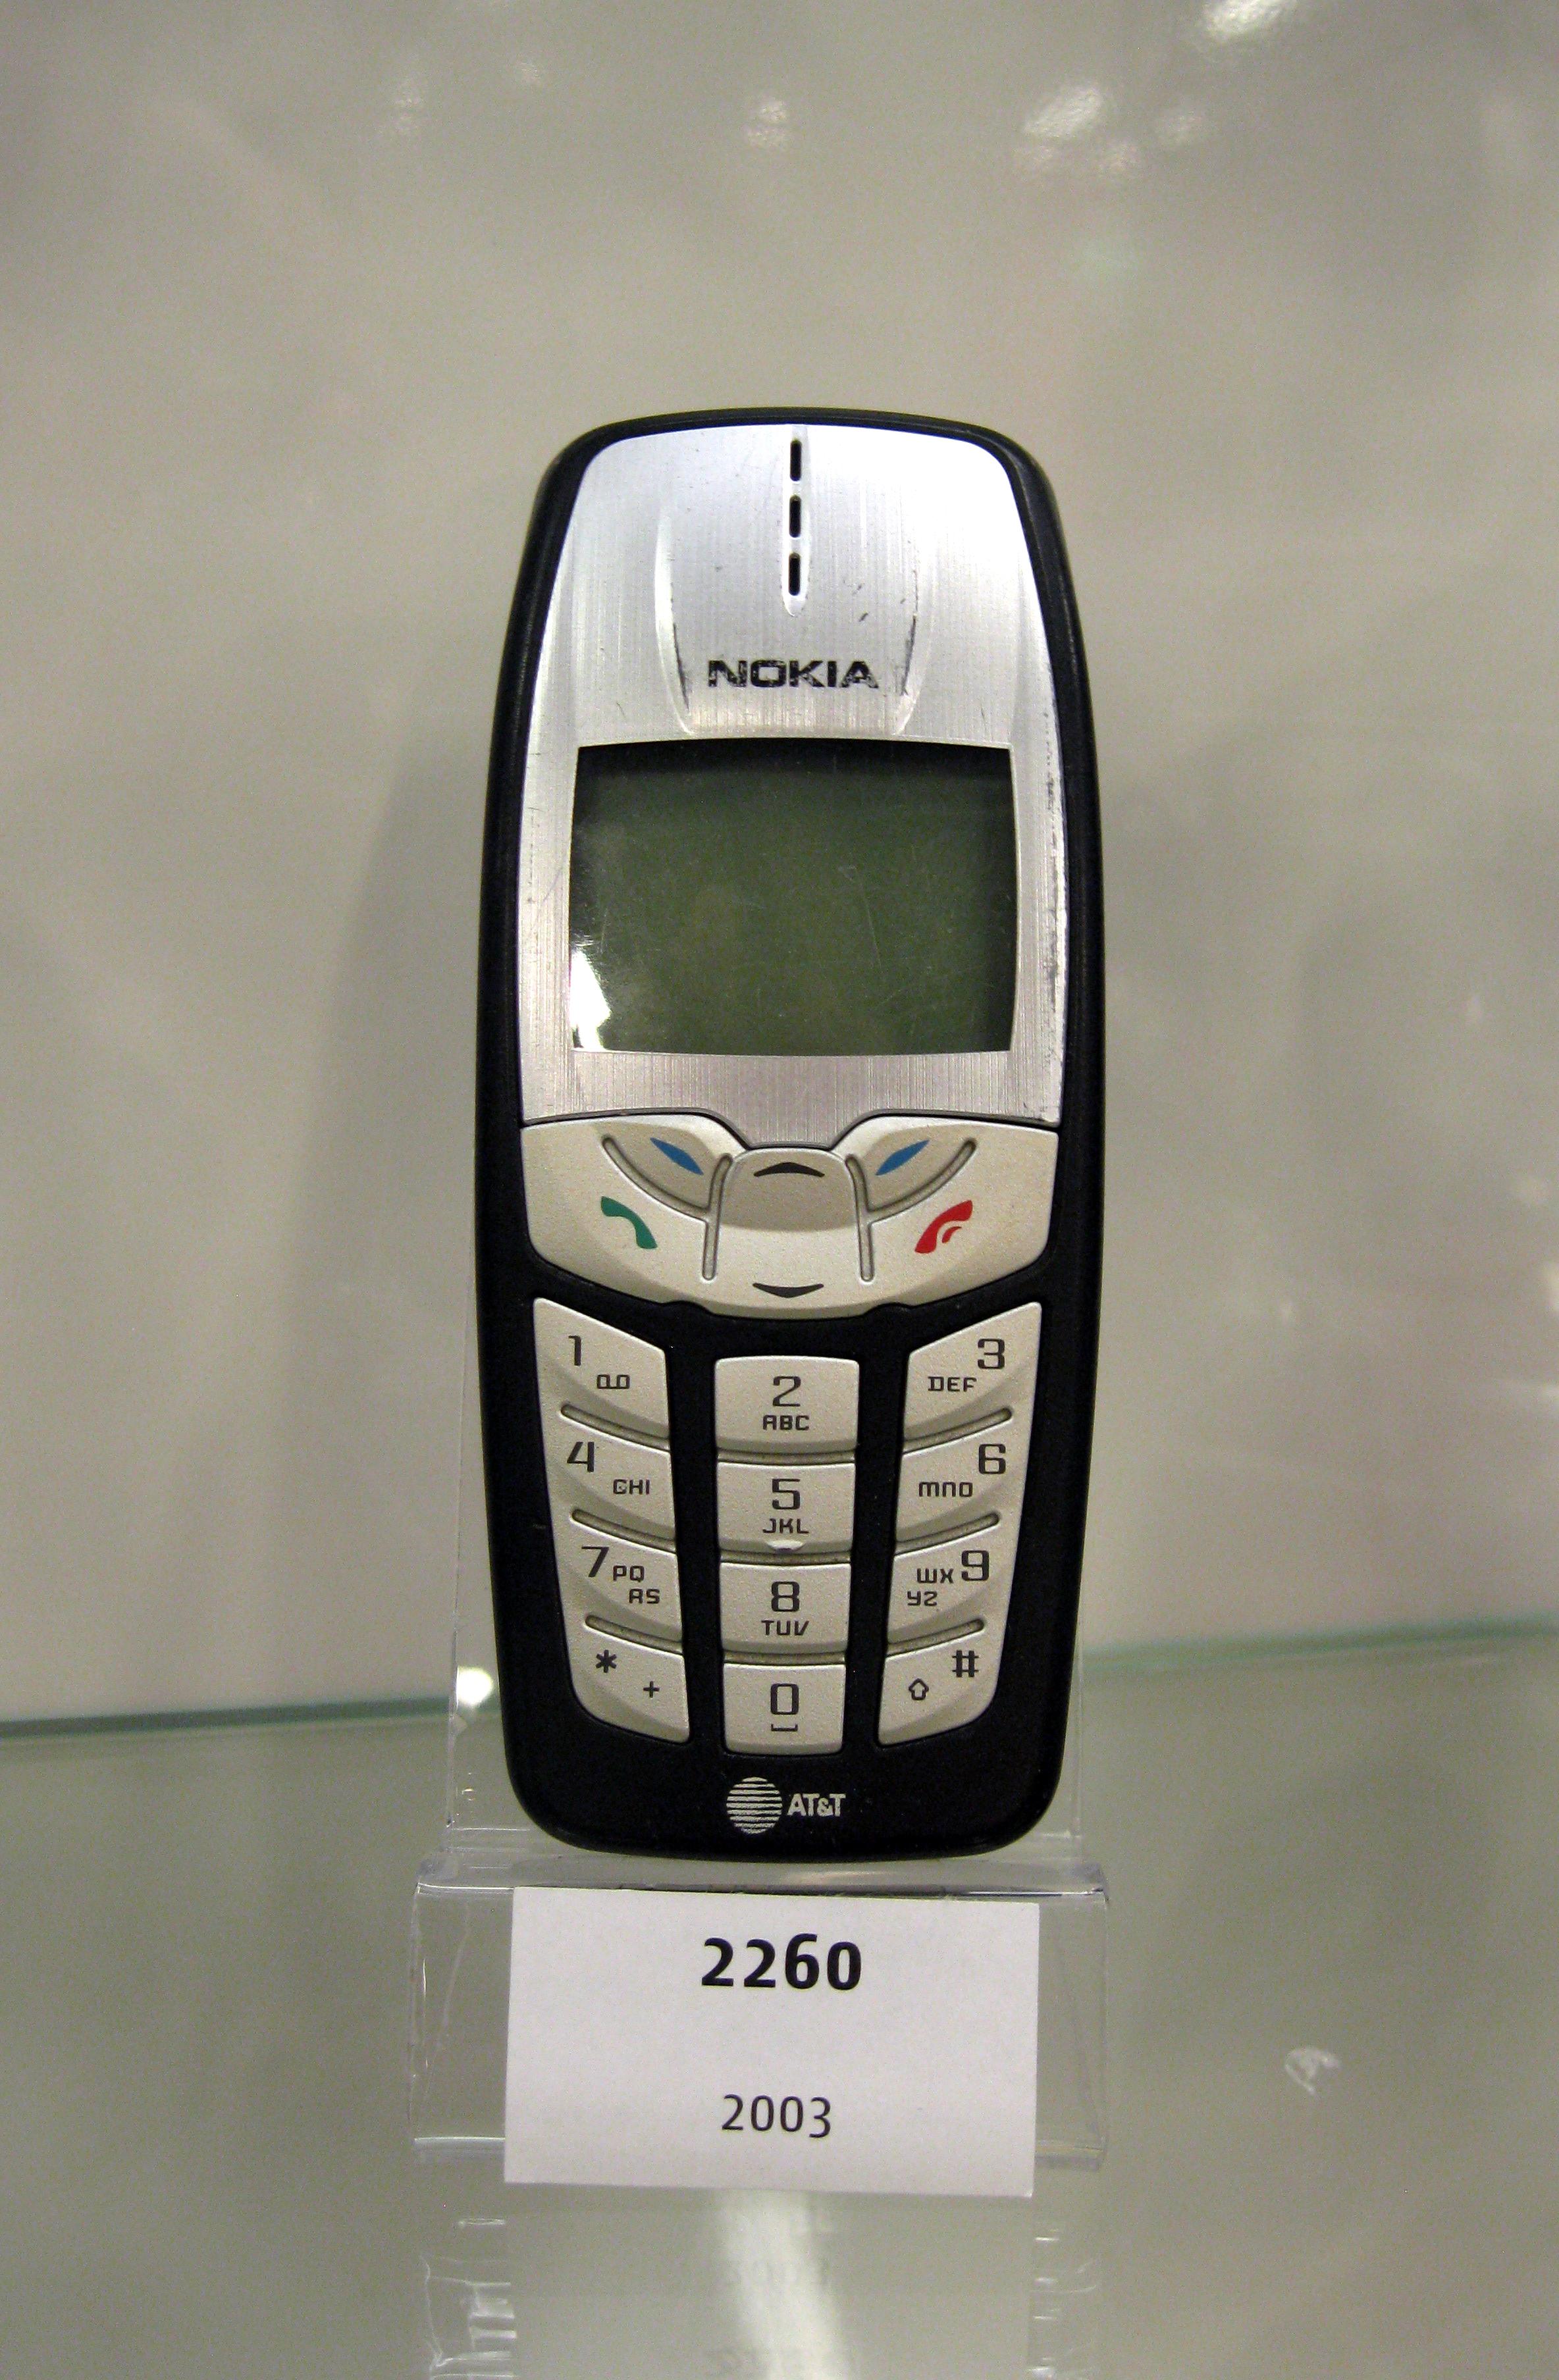 File:Nokia 2260.jpg